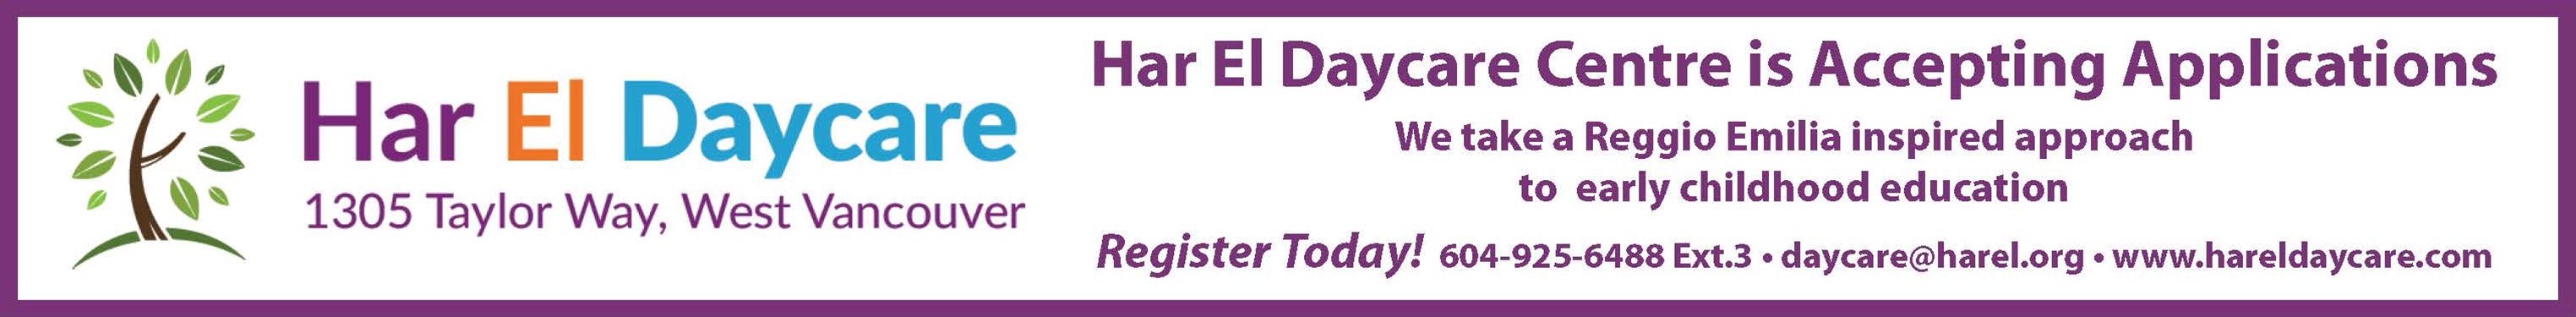 Har El Daycare Centre - fall 2017 applications